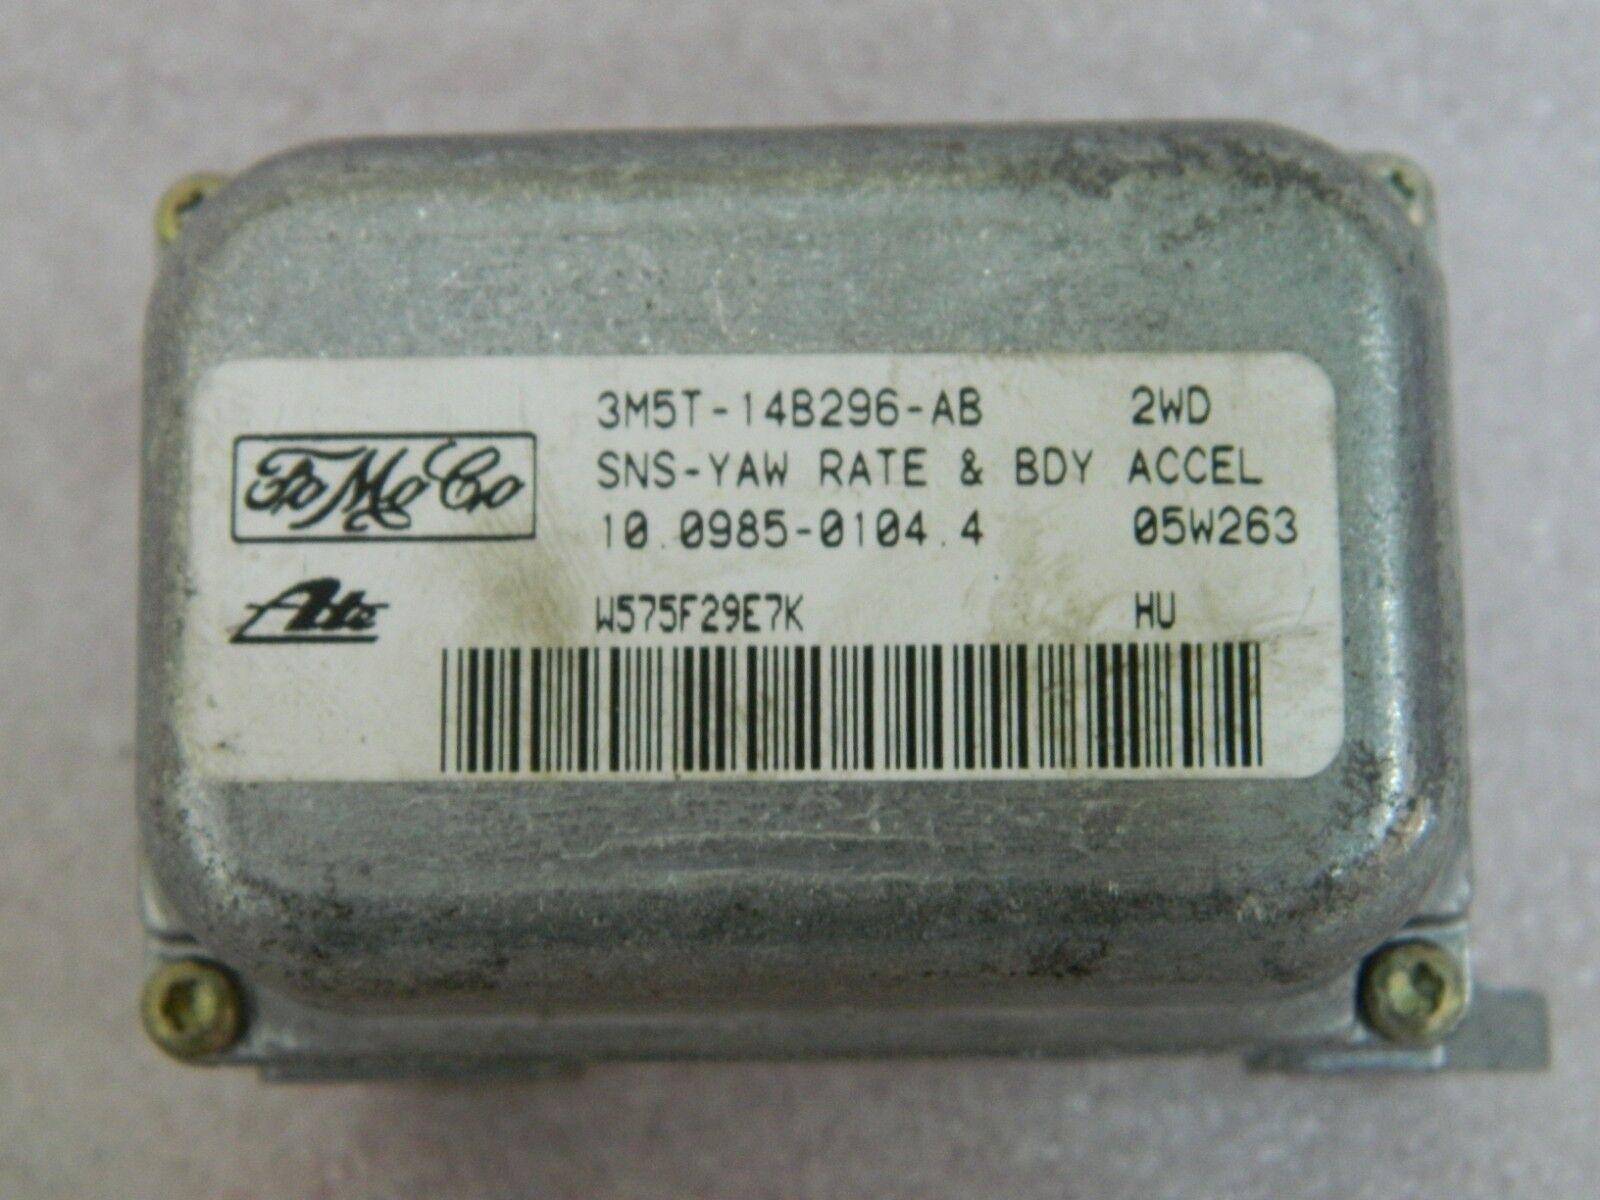 VOLVO C30 S40 V50 ESP YAW RATE SENSOR 3M5T-14B296-AB